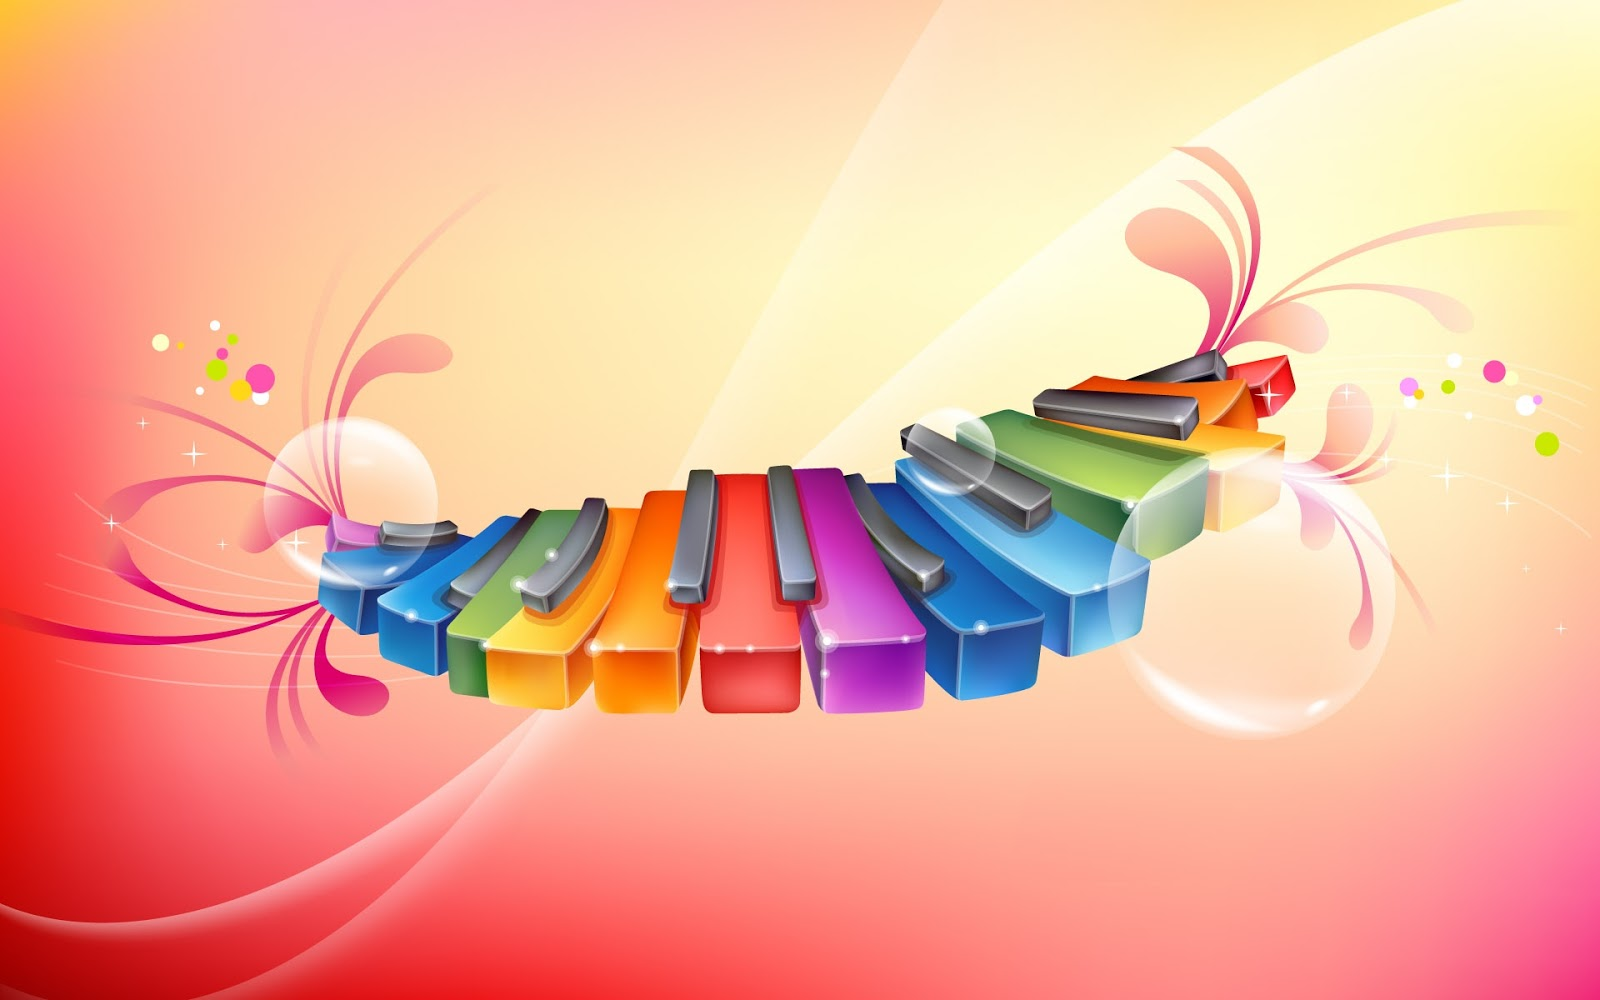 Colorful Wallpaper Download